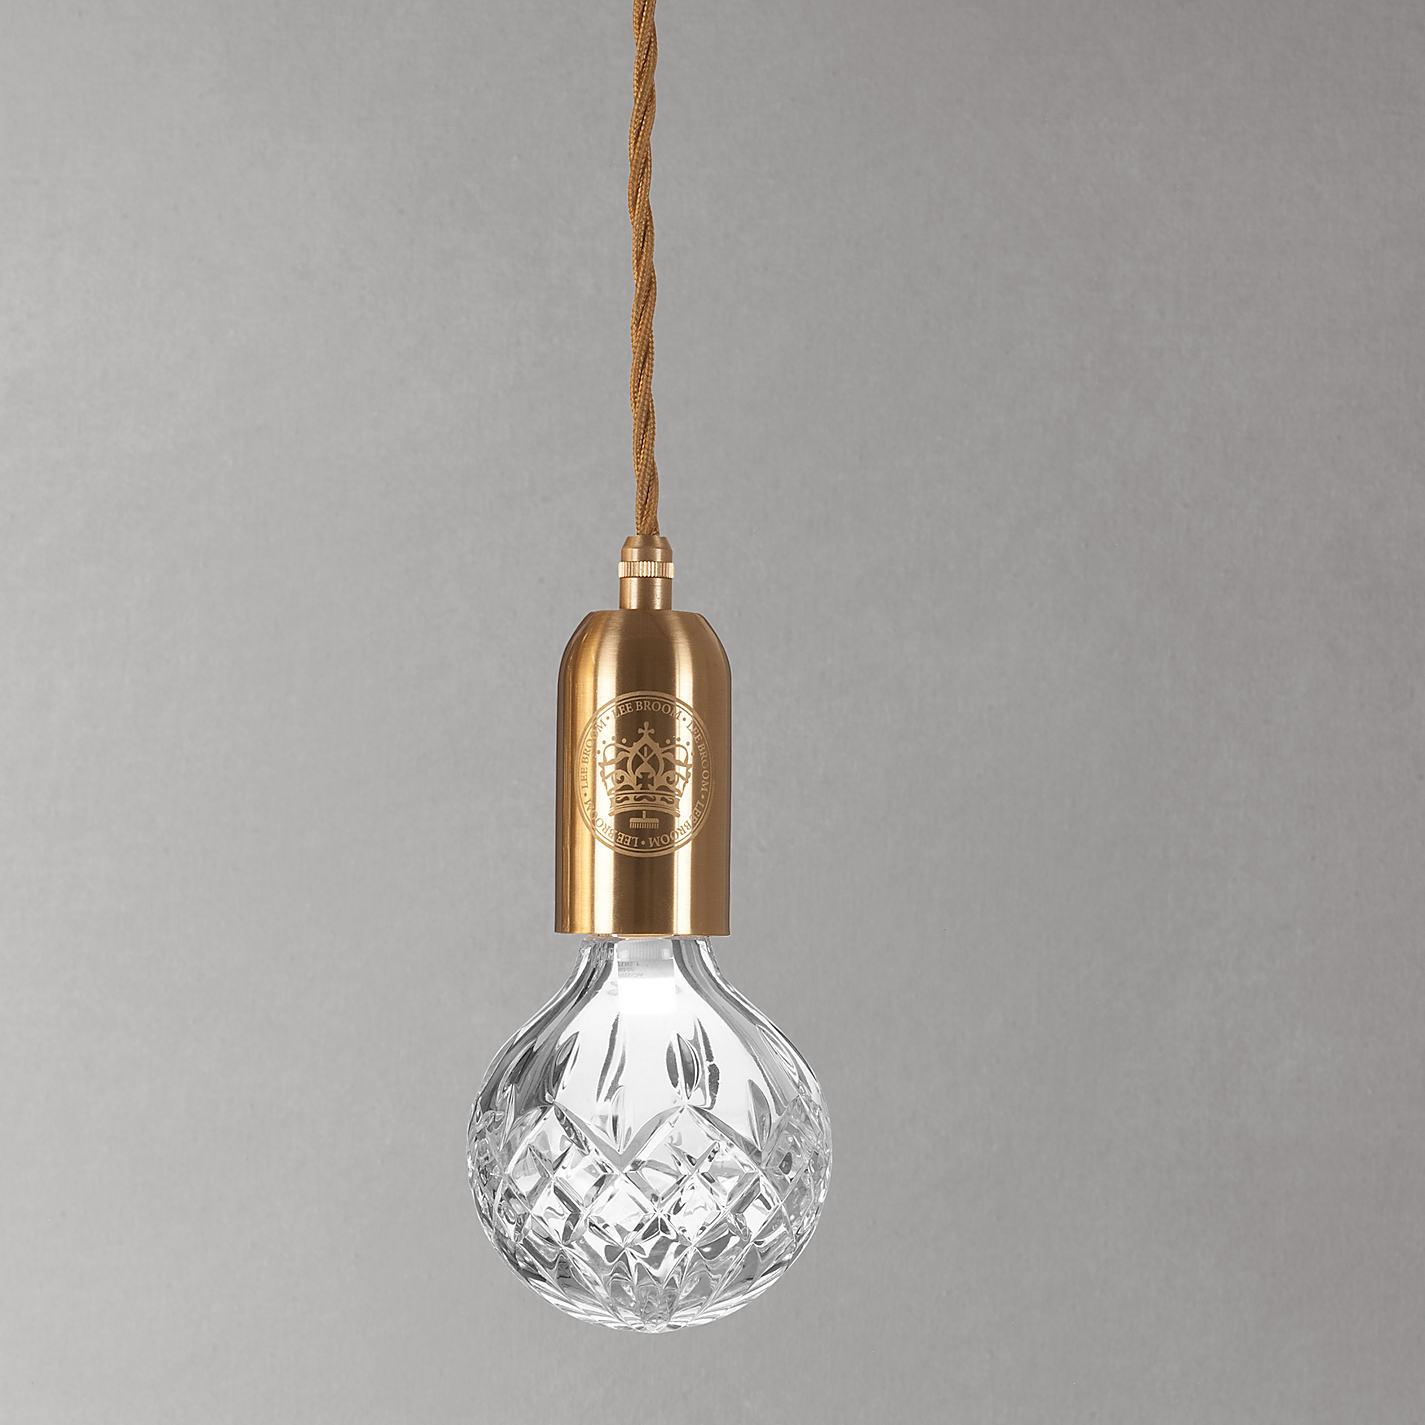 Lee Broom Ring Light